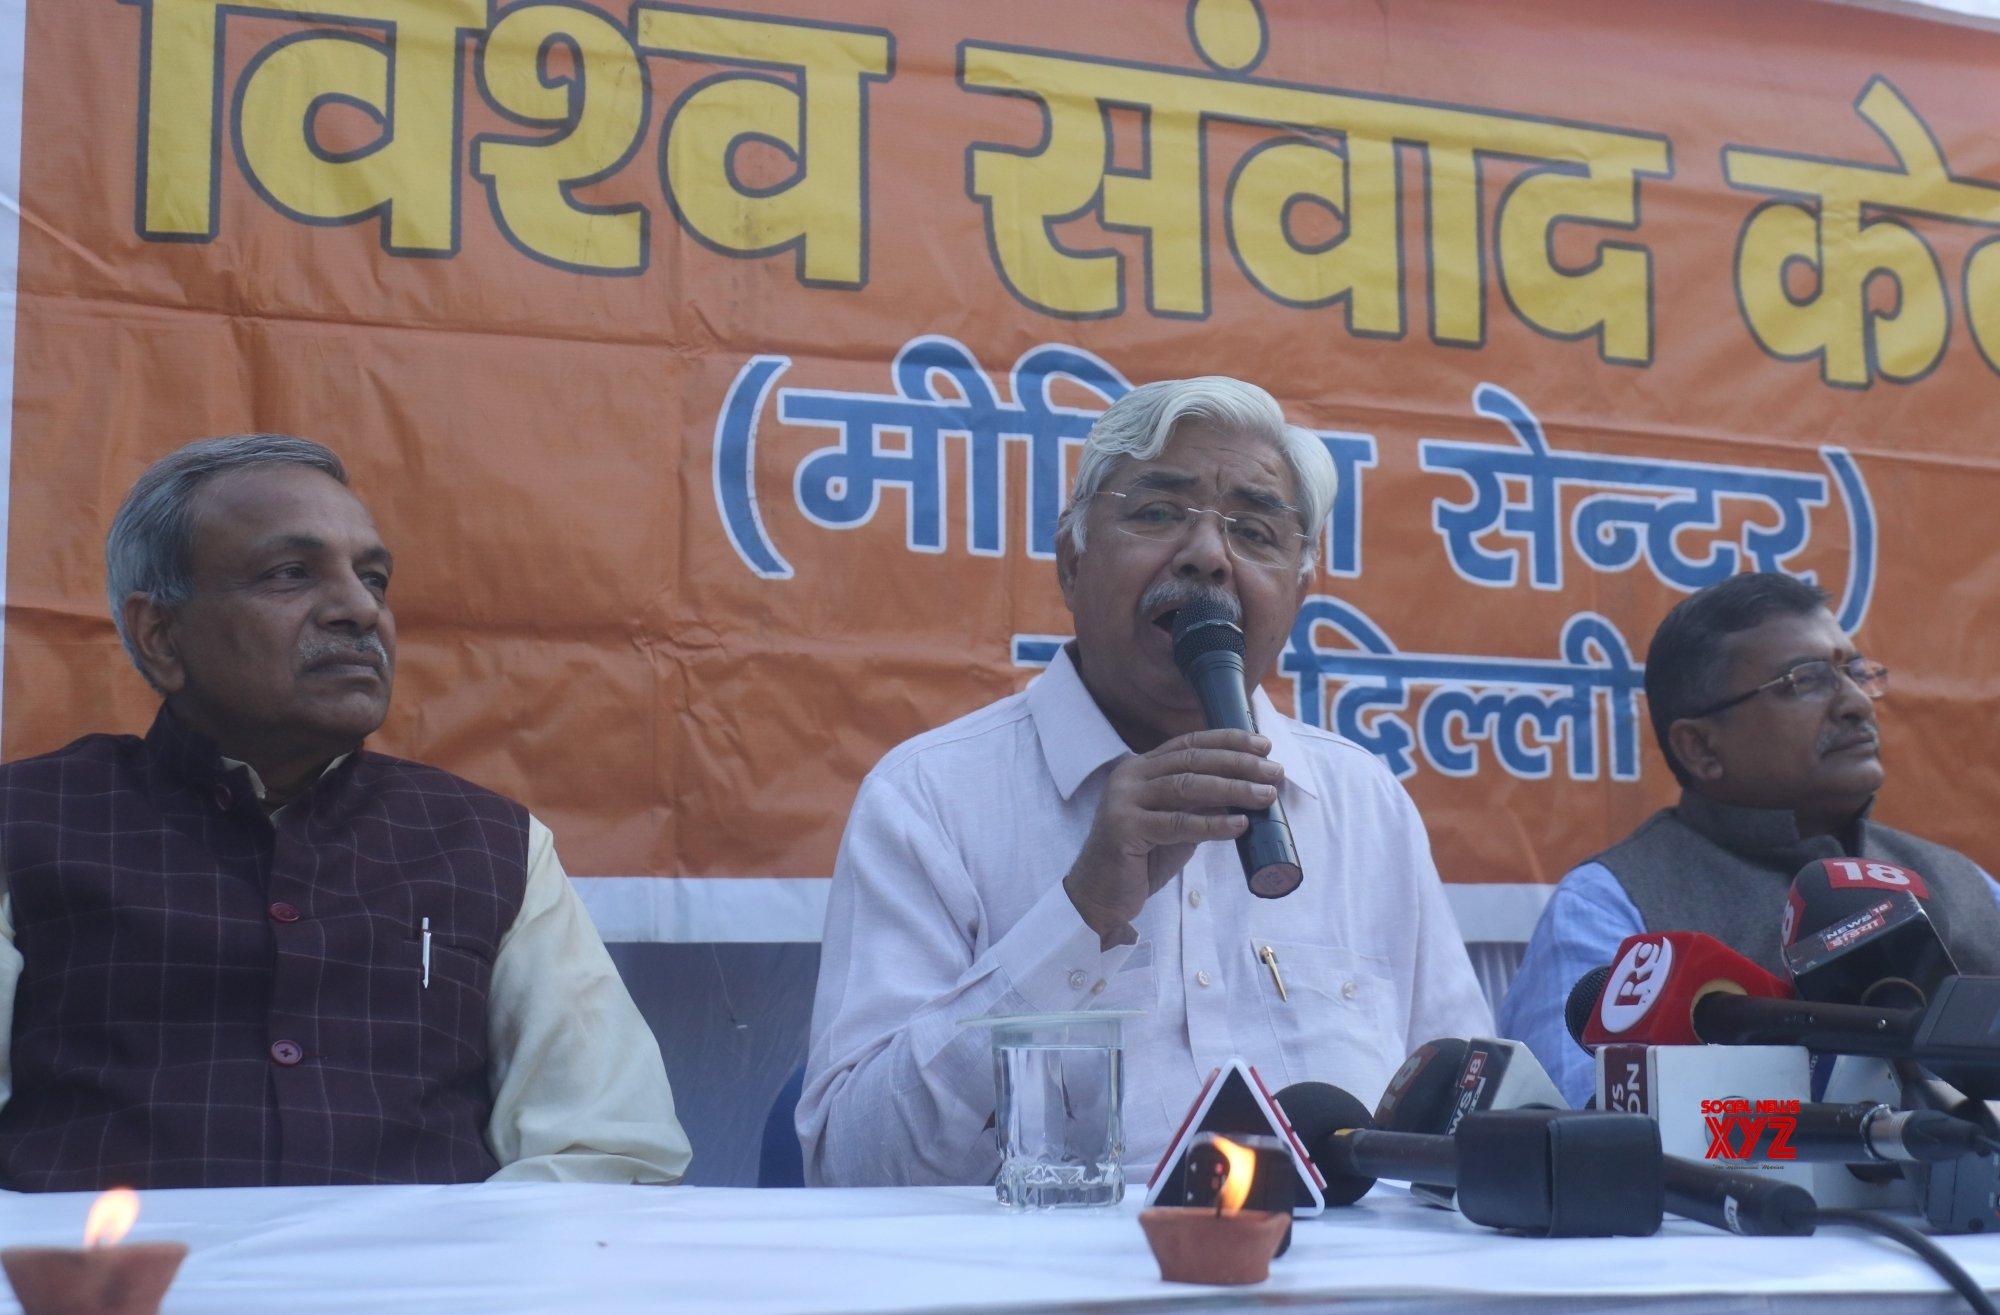 New Delhi: VHP's press conference #Gallery